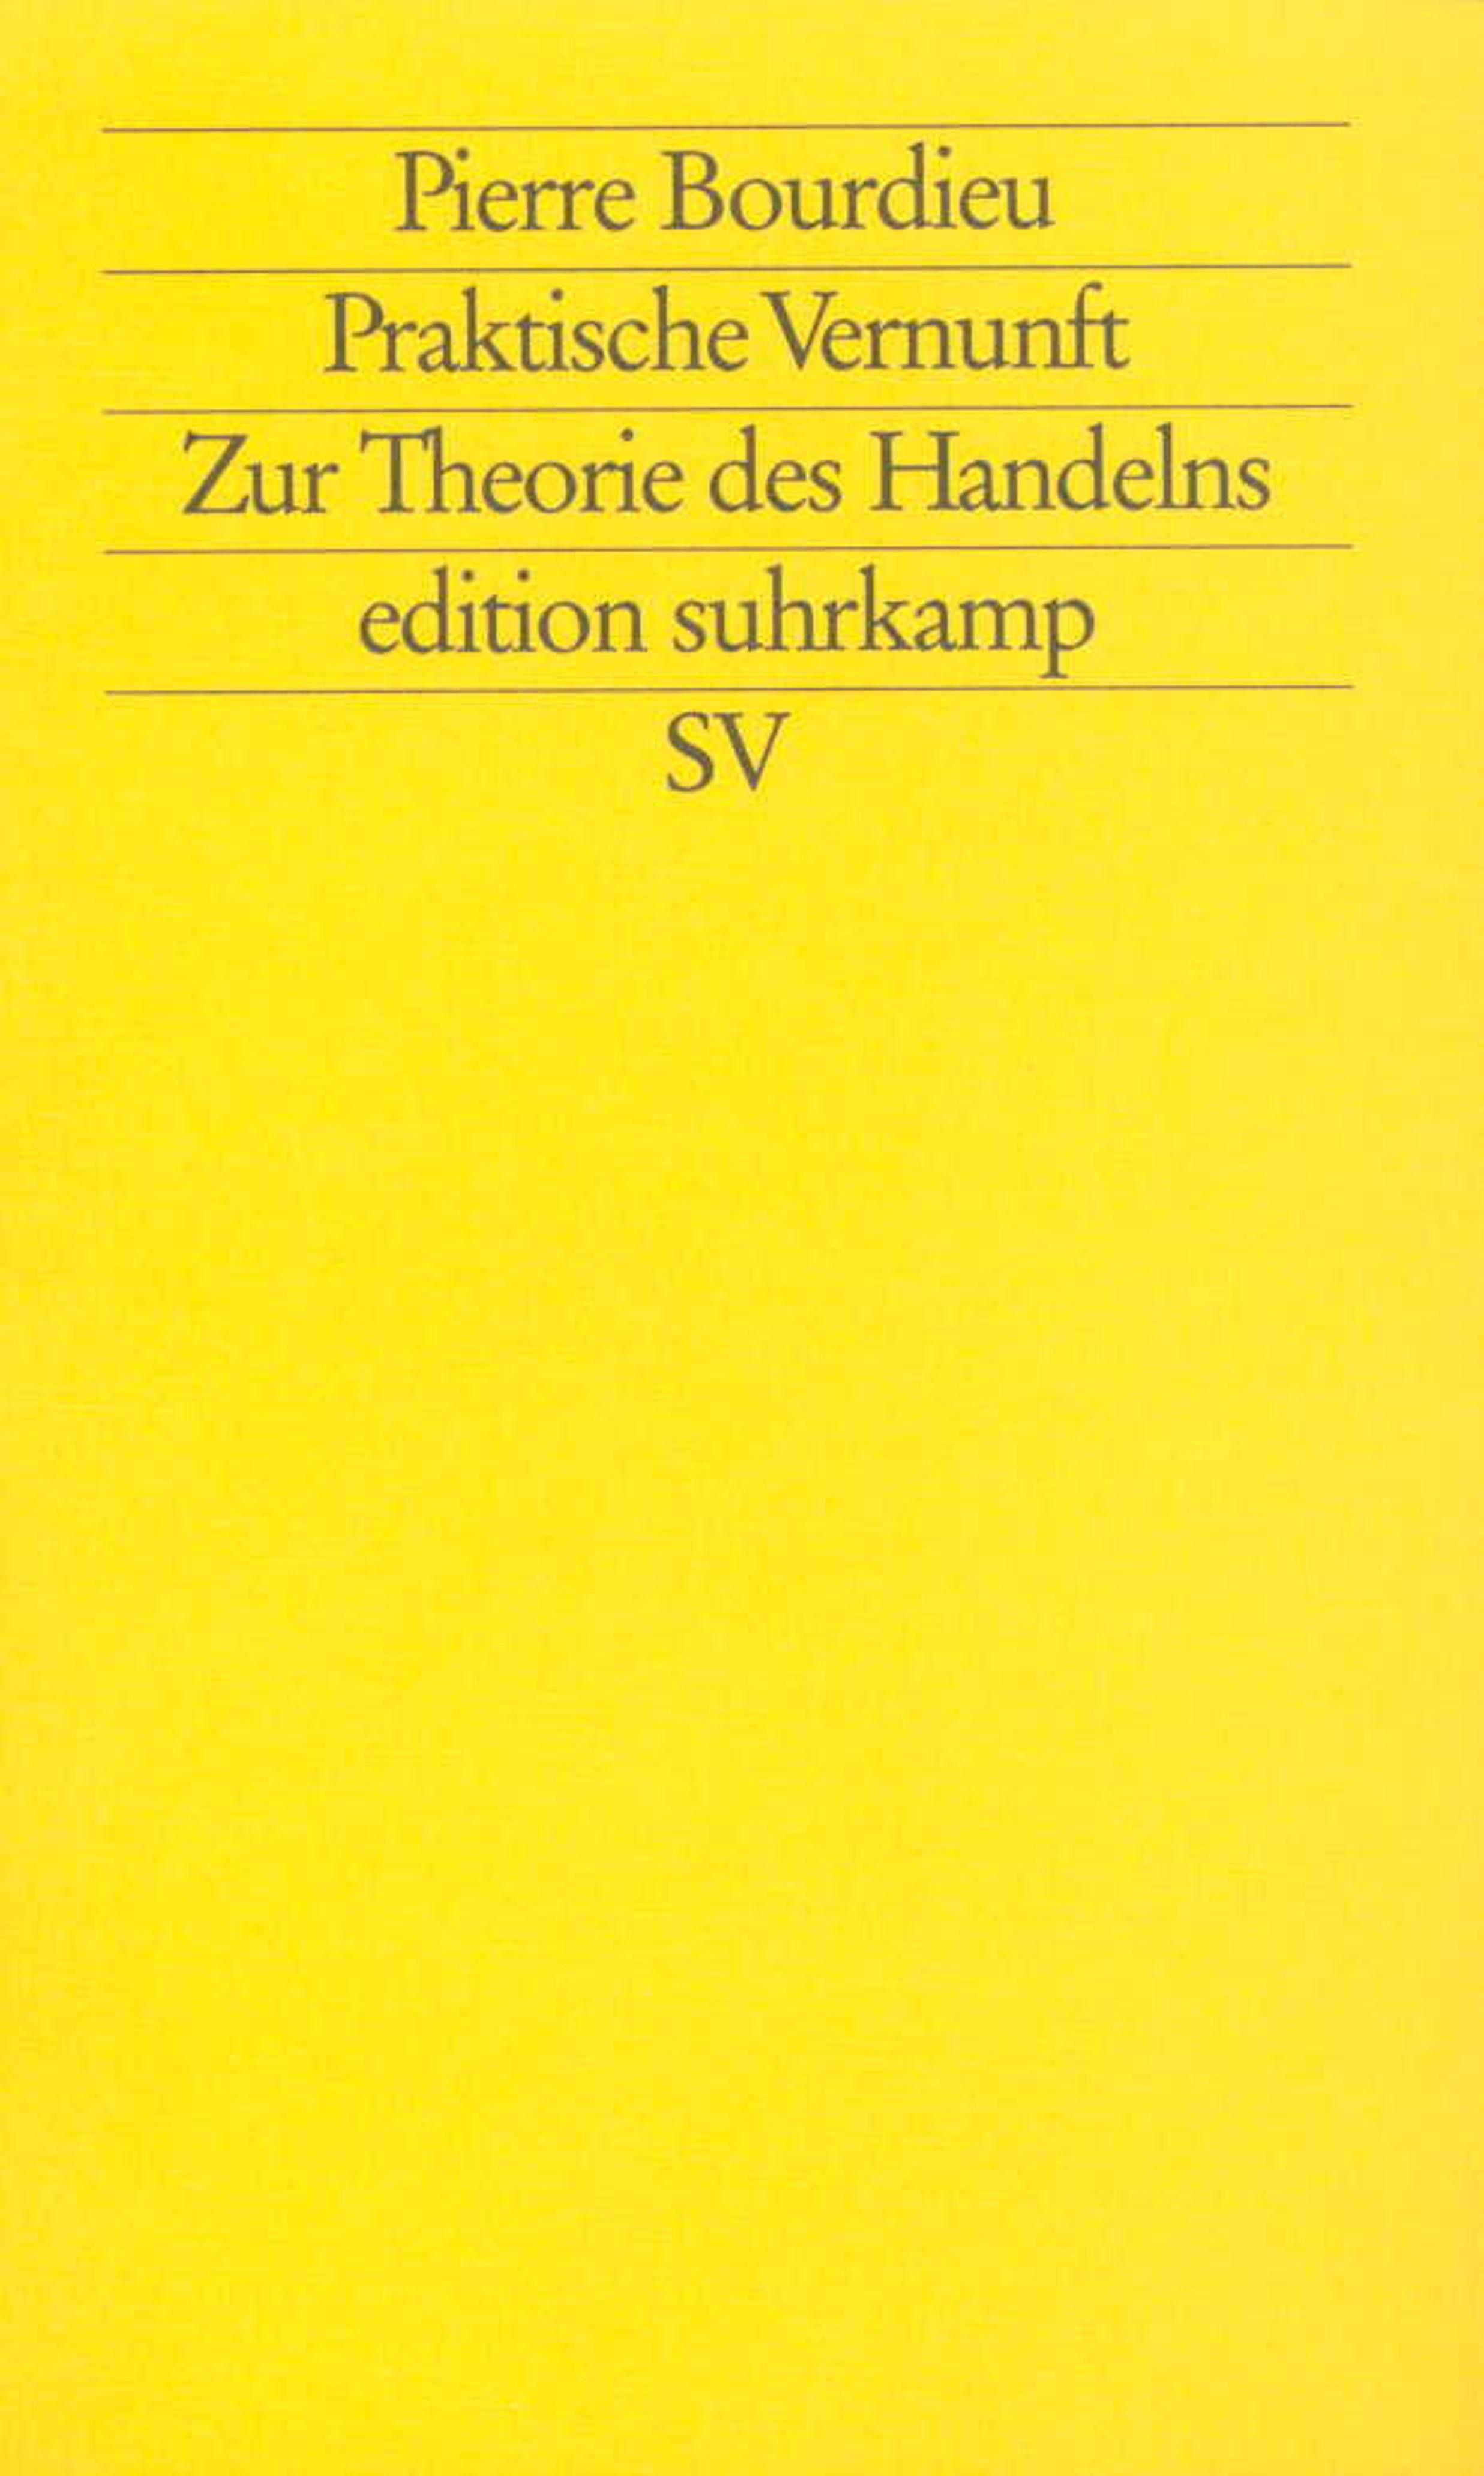 Praktische Vernunft | Bourdieu, 1998 | Buch (Cover)